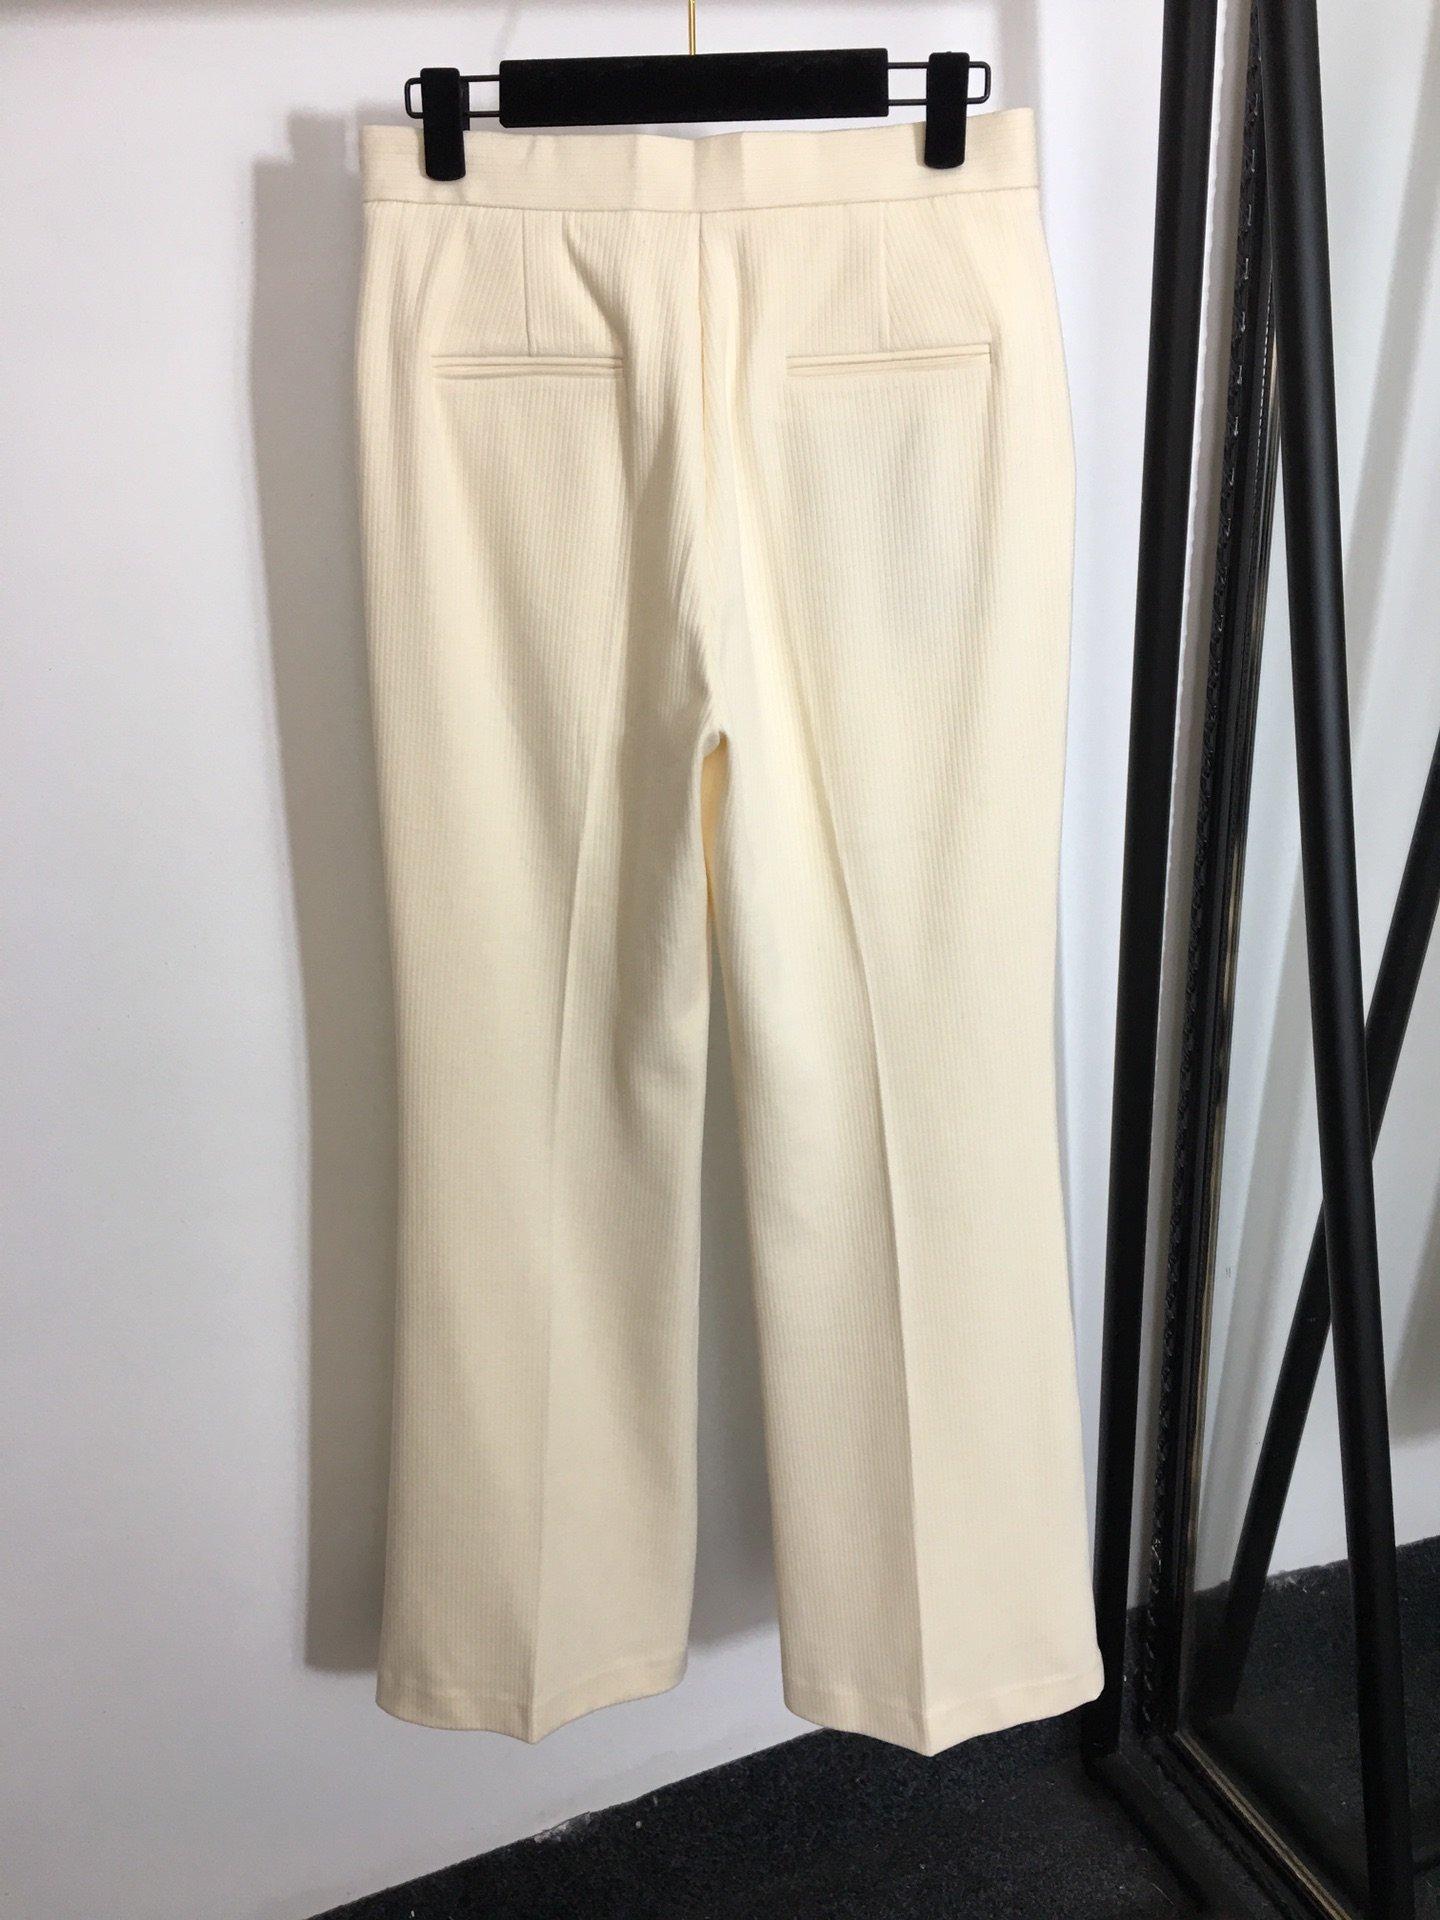 MaxMara新款垂坠感高腰阔腿长裤